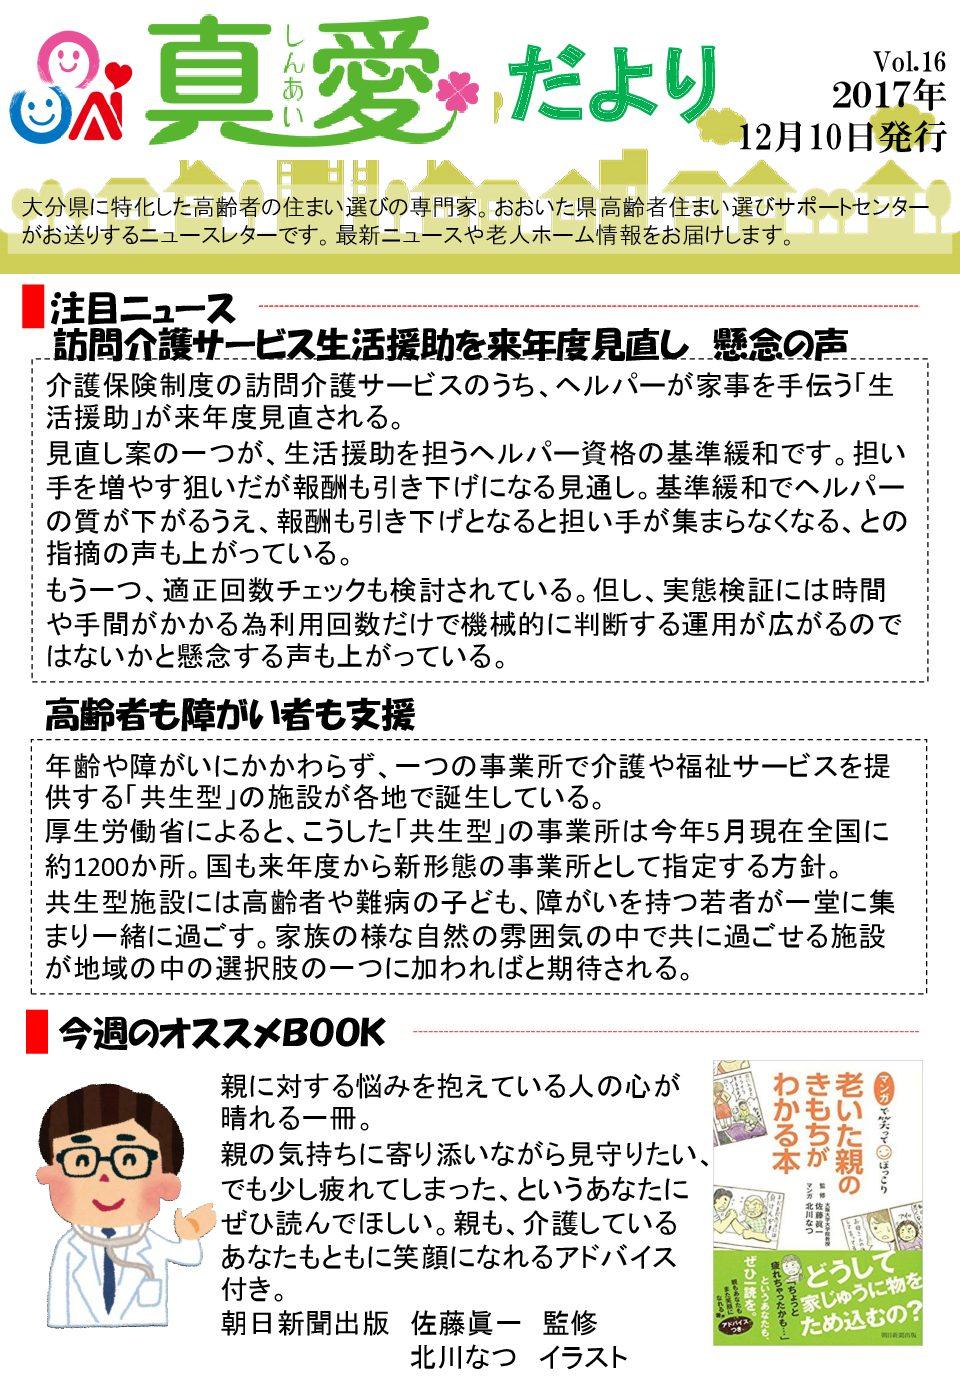 【Vol.16】 2017.12.10発行